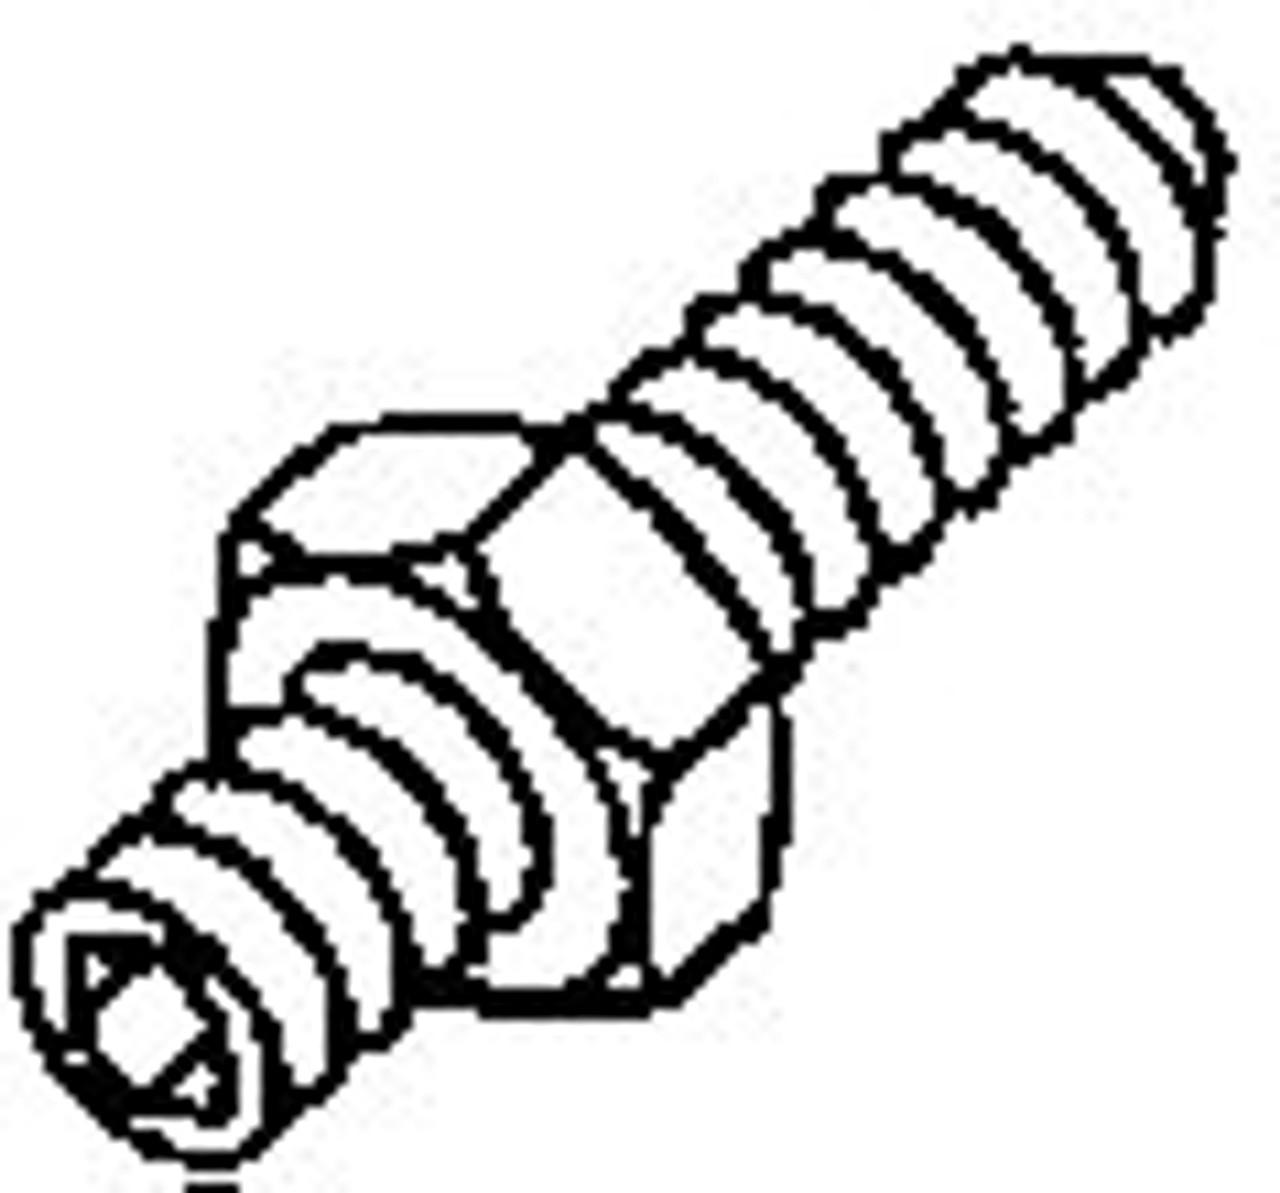 Biro Saw - Upper Wheel Aligning Screw - 33,34,3334 - B076